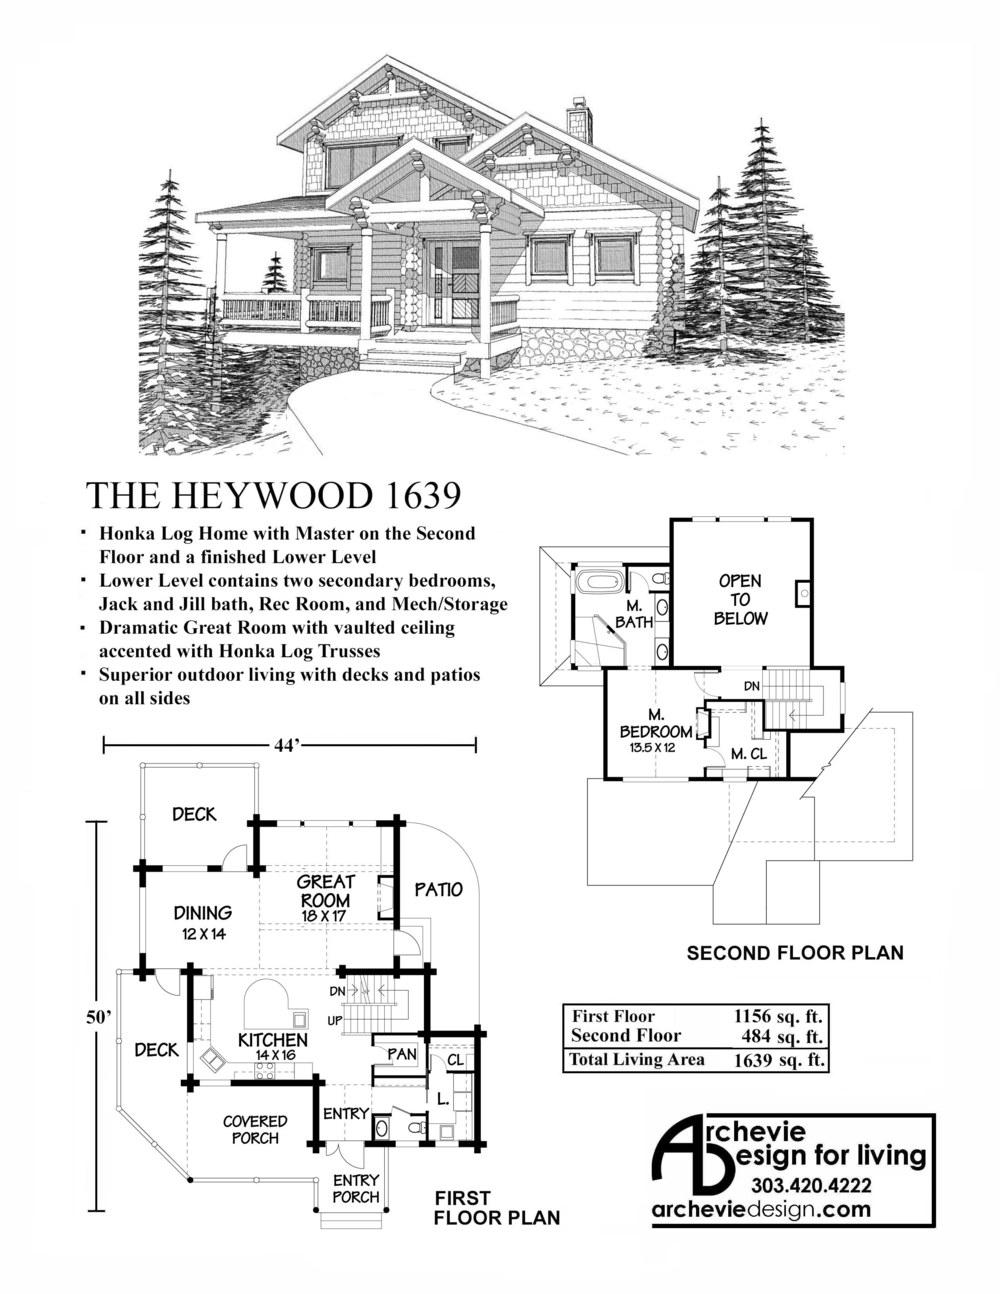 HEYWOOD1639.jpg